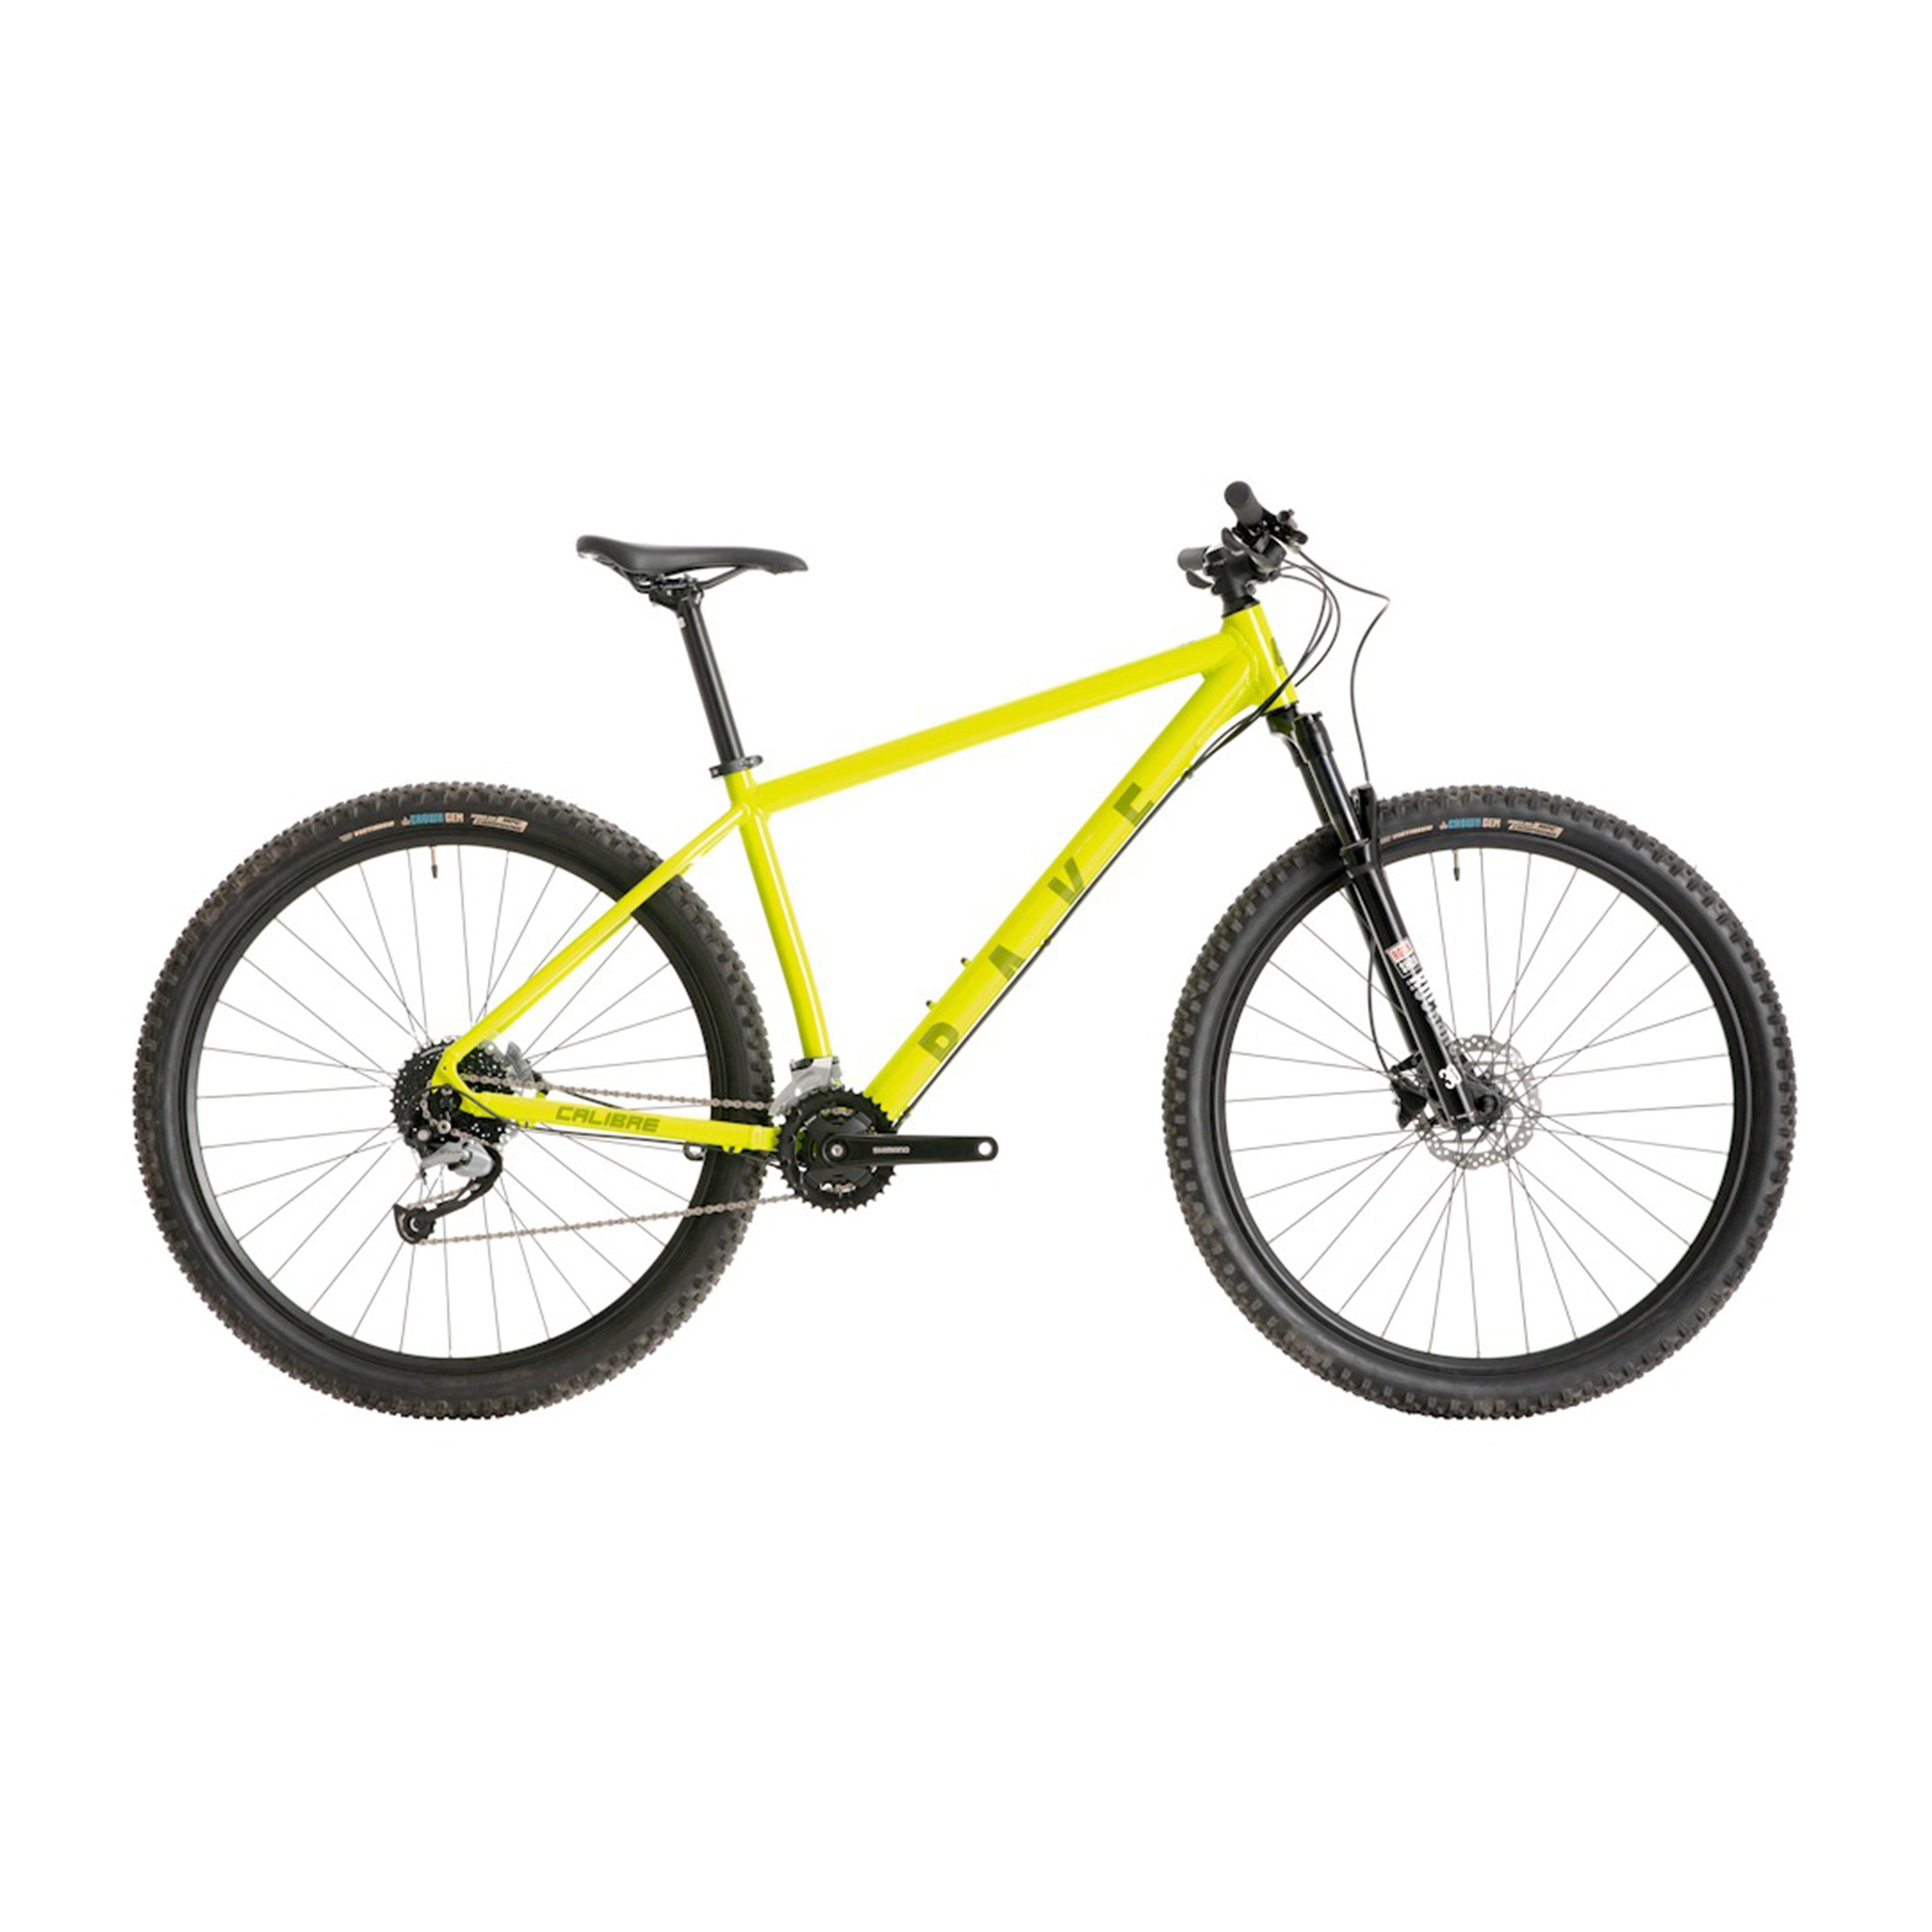 Calibre Rake Mountain Bike £427.50 with code @ Ultimate Outdoors